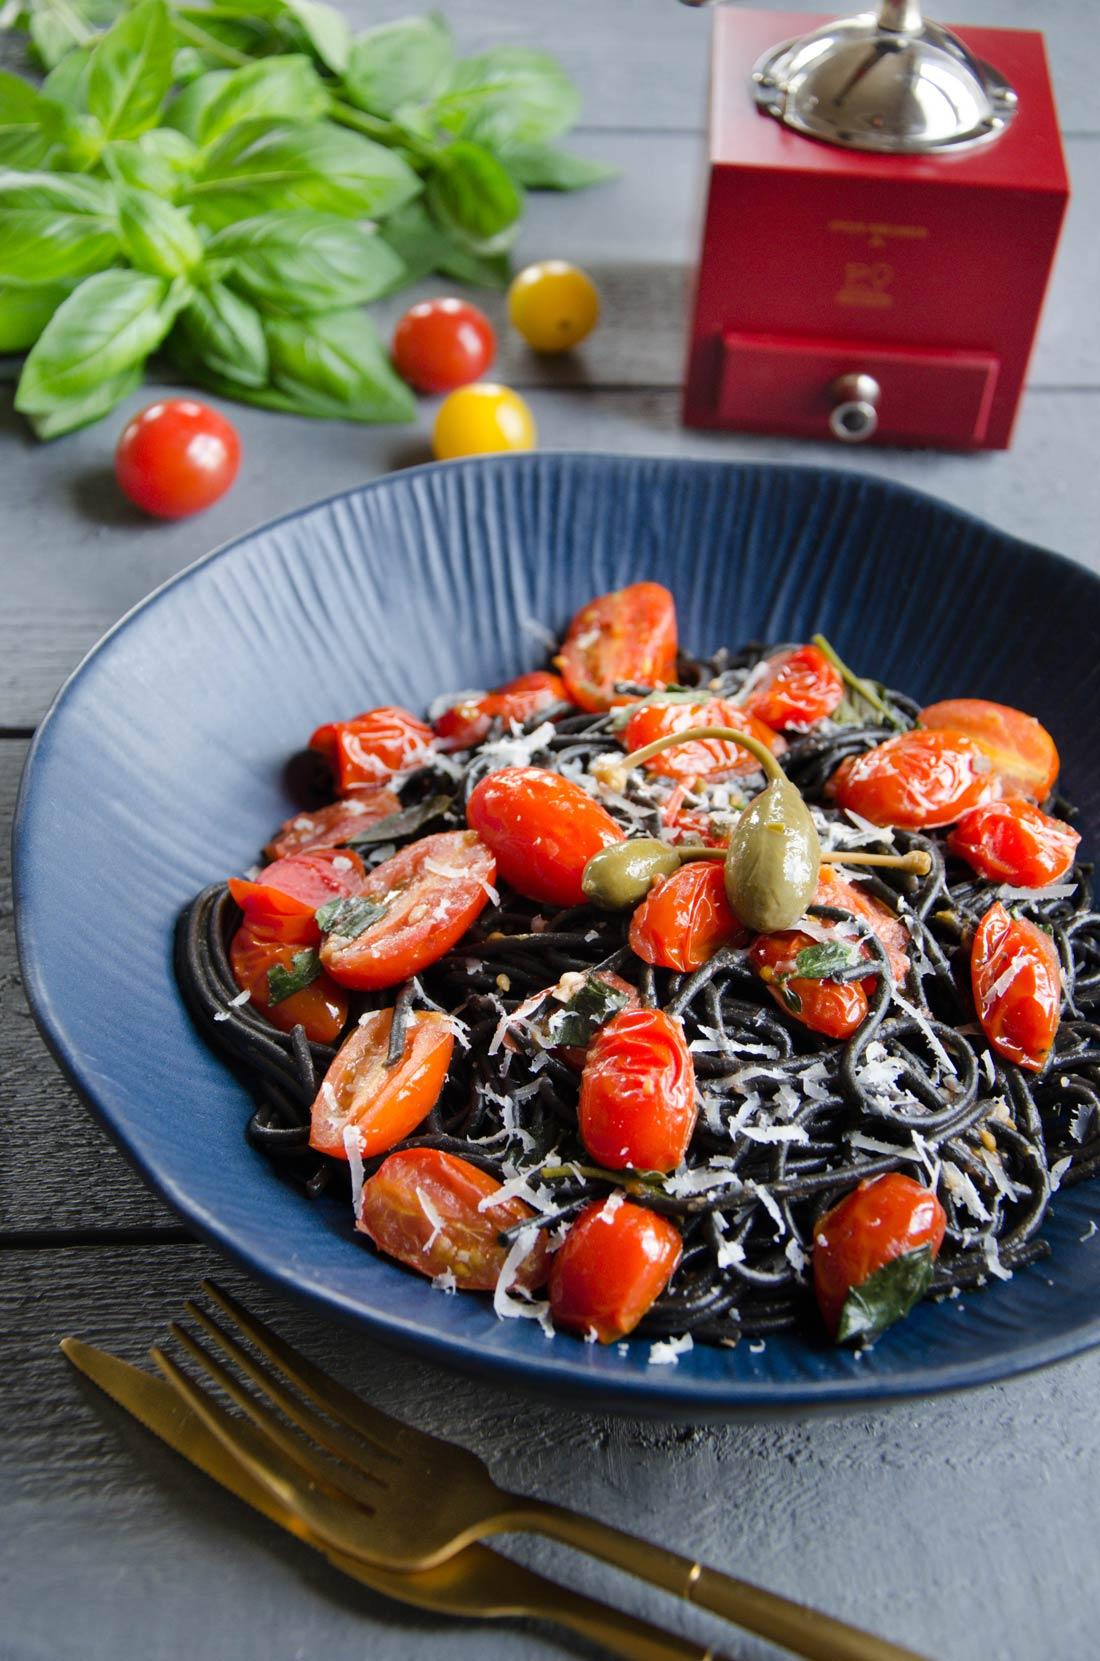 Pâtes à l'italienne tomates cerises, ail, basilic